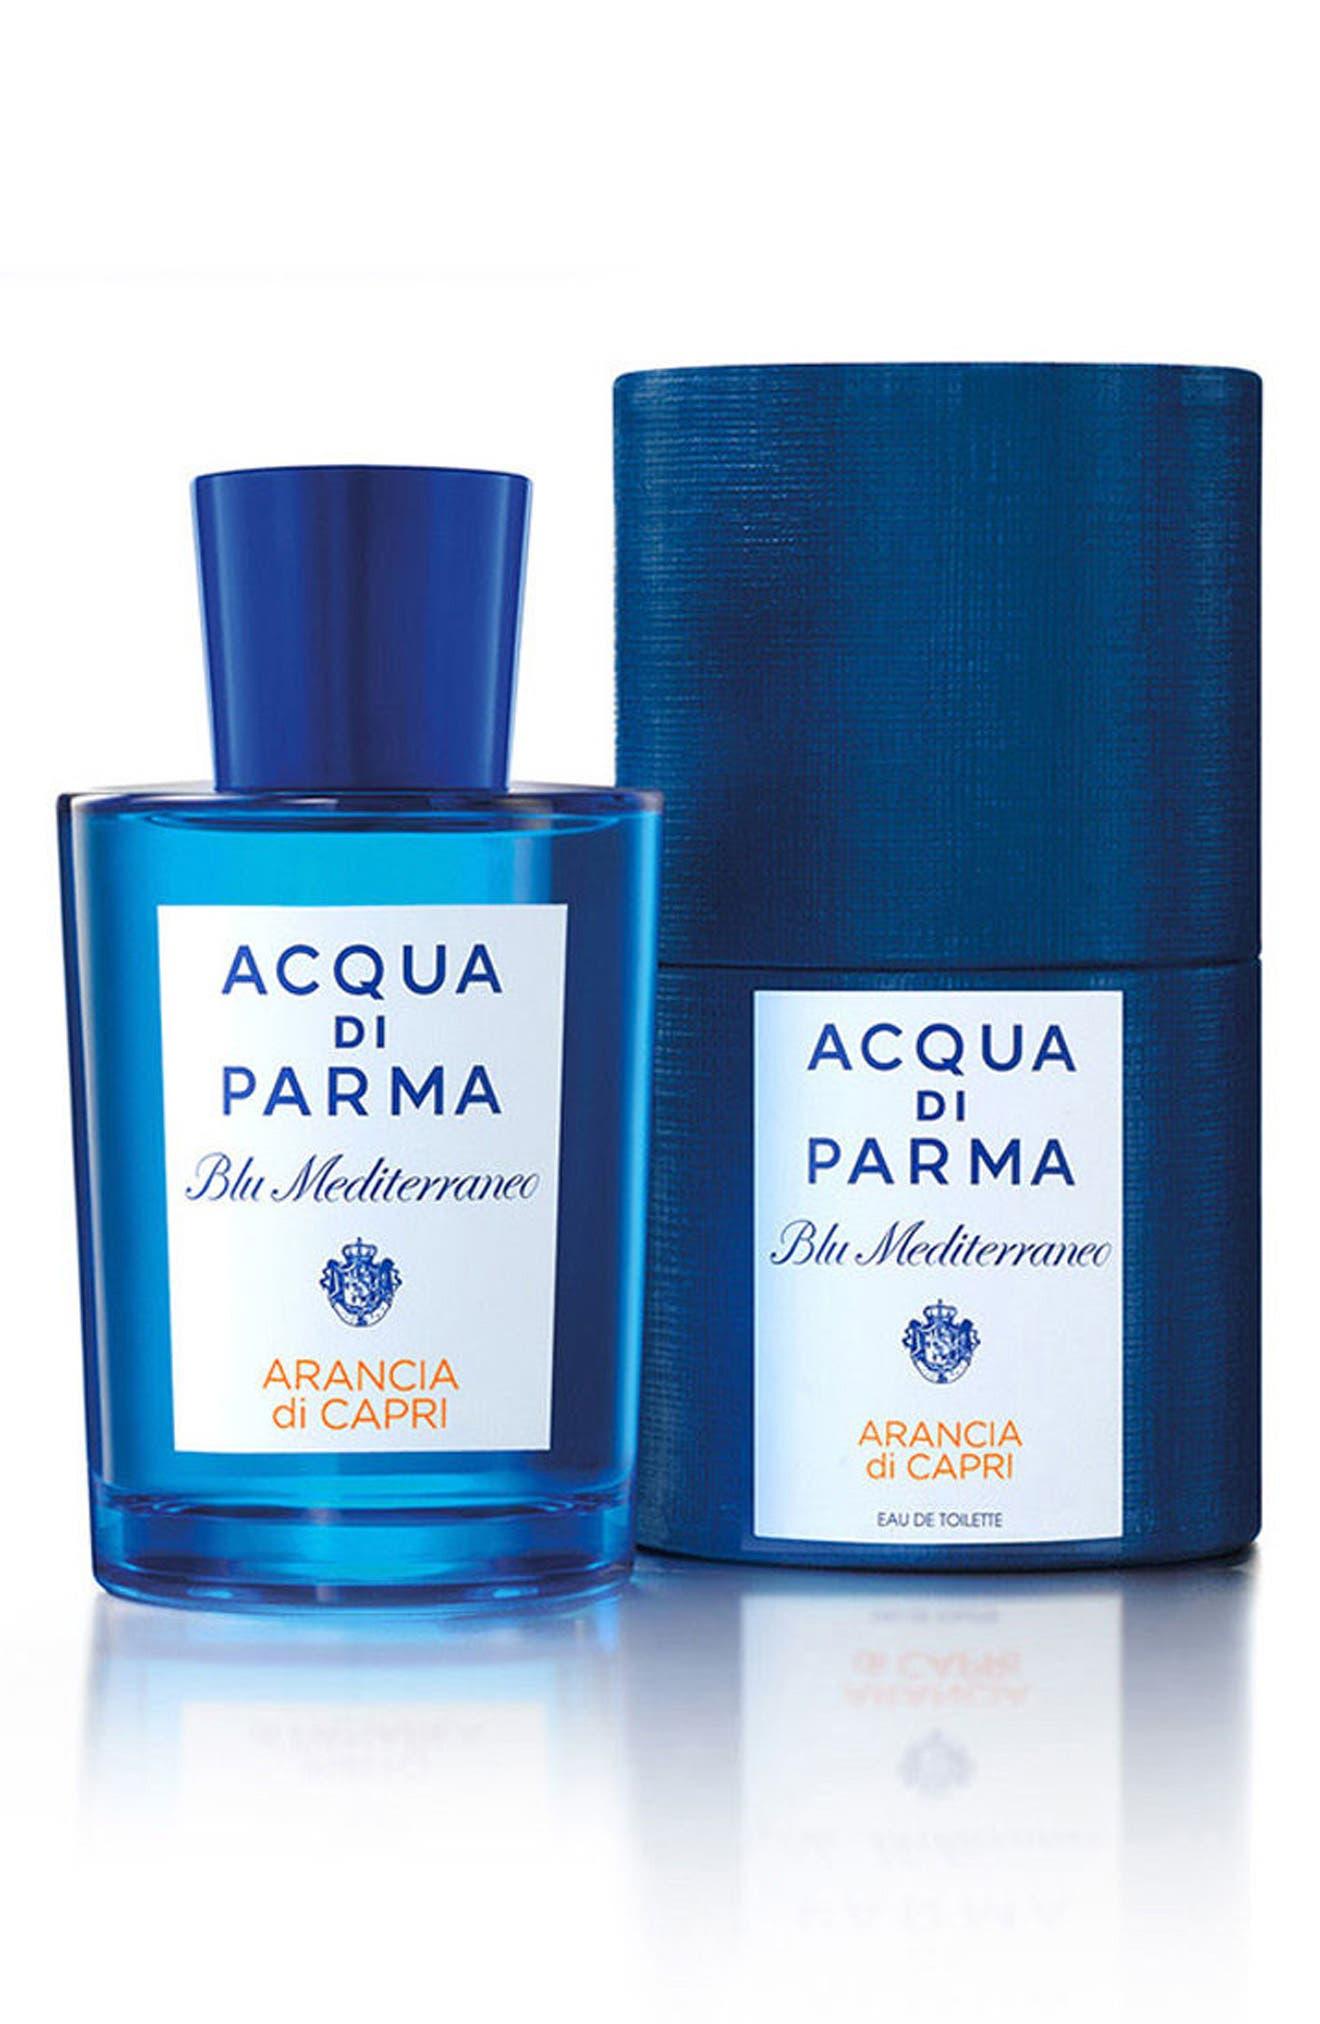 ACQUA DI PARMA, Blu Mediterraneo Arancia di Capri Eau de Toilette, Alternate thumbnail 3, color, NO COLOR